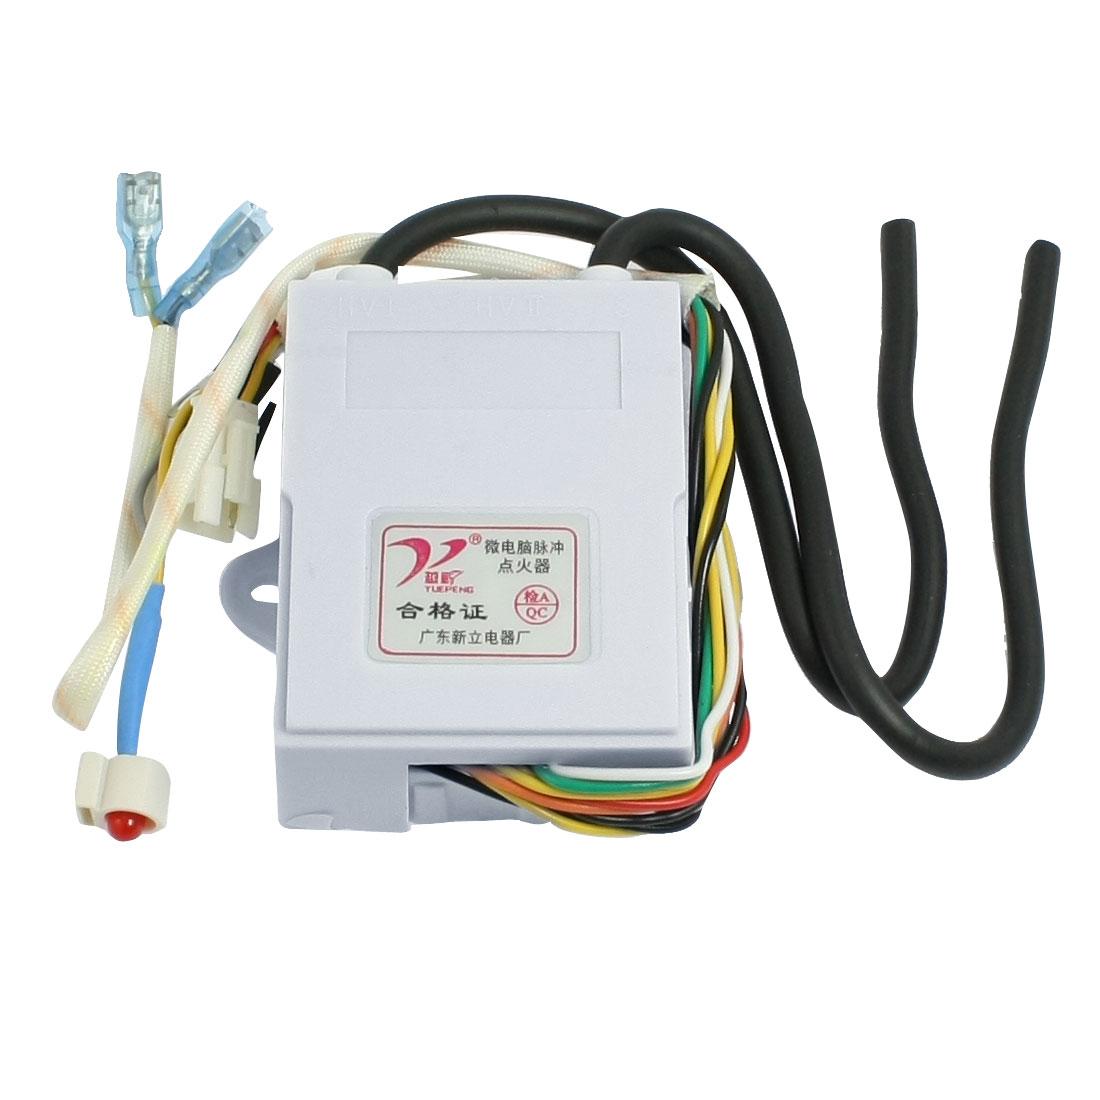 Plastic Shell IC Control Double Ignitering Cord Flue Gas Stove Pulse Igniter